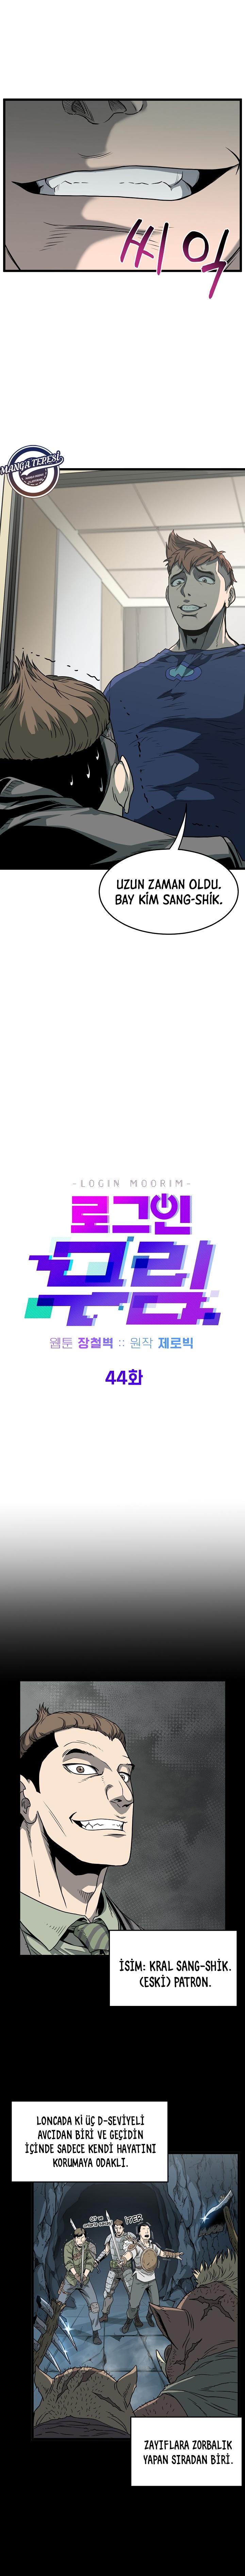 murim-loginbolum-44